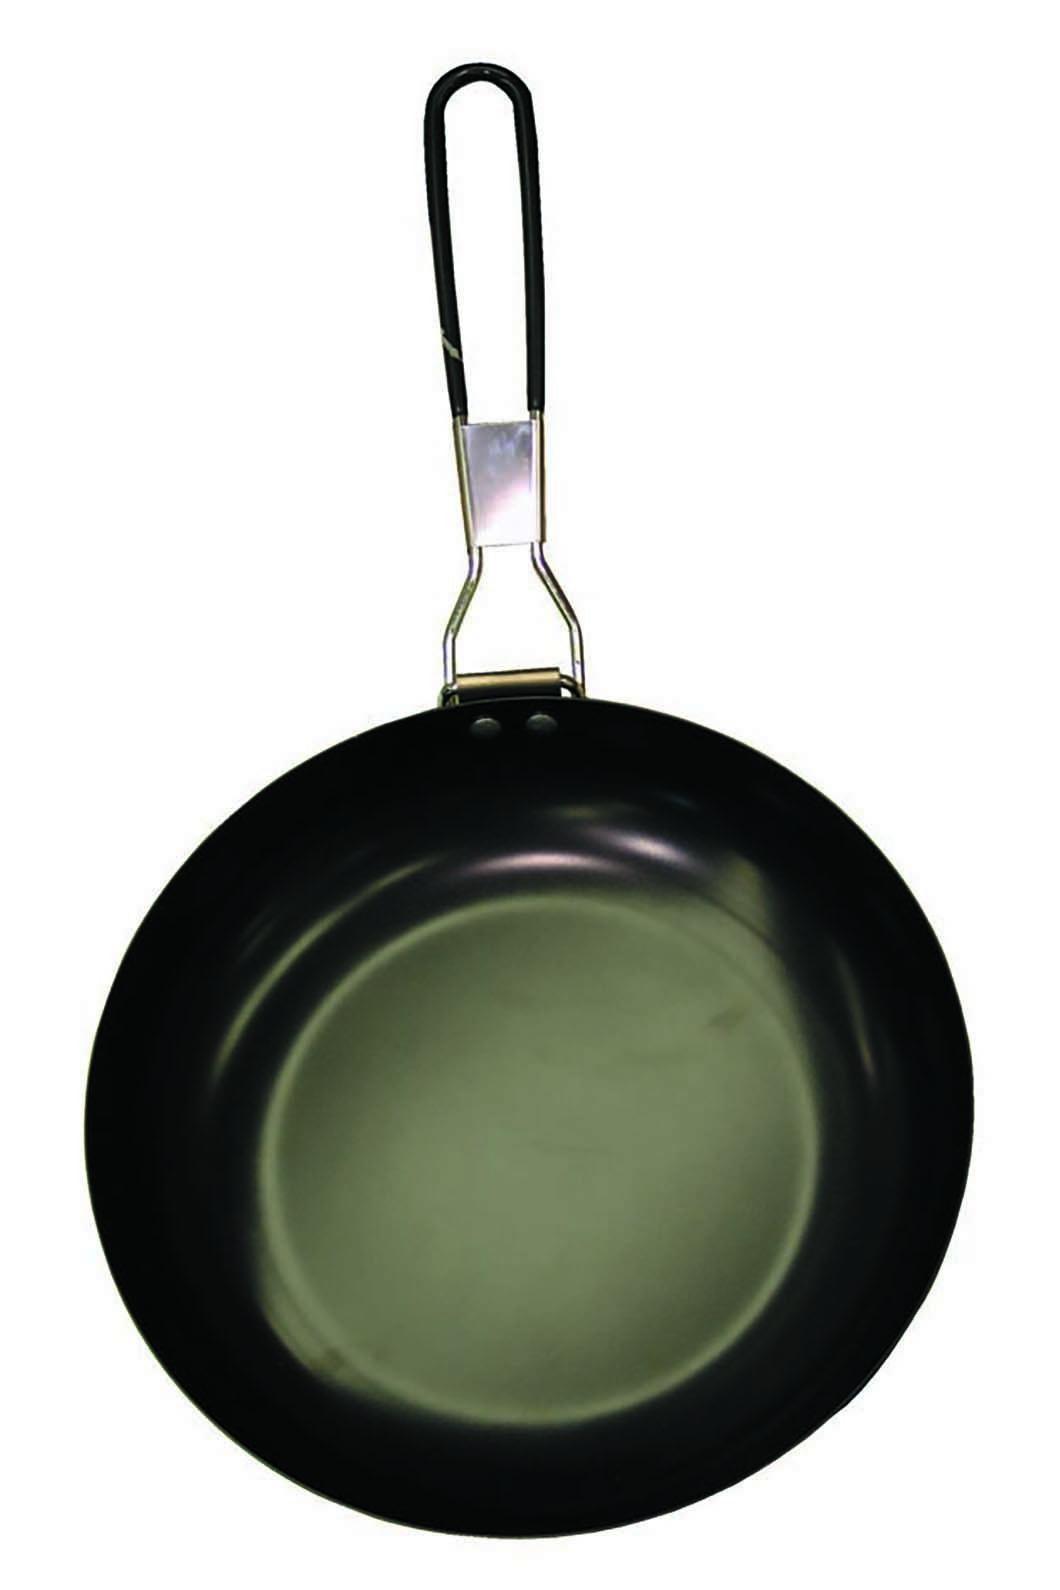 Coleman 22cm Non-Stick Fry pan, None, hi-res